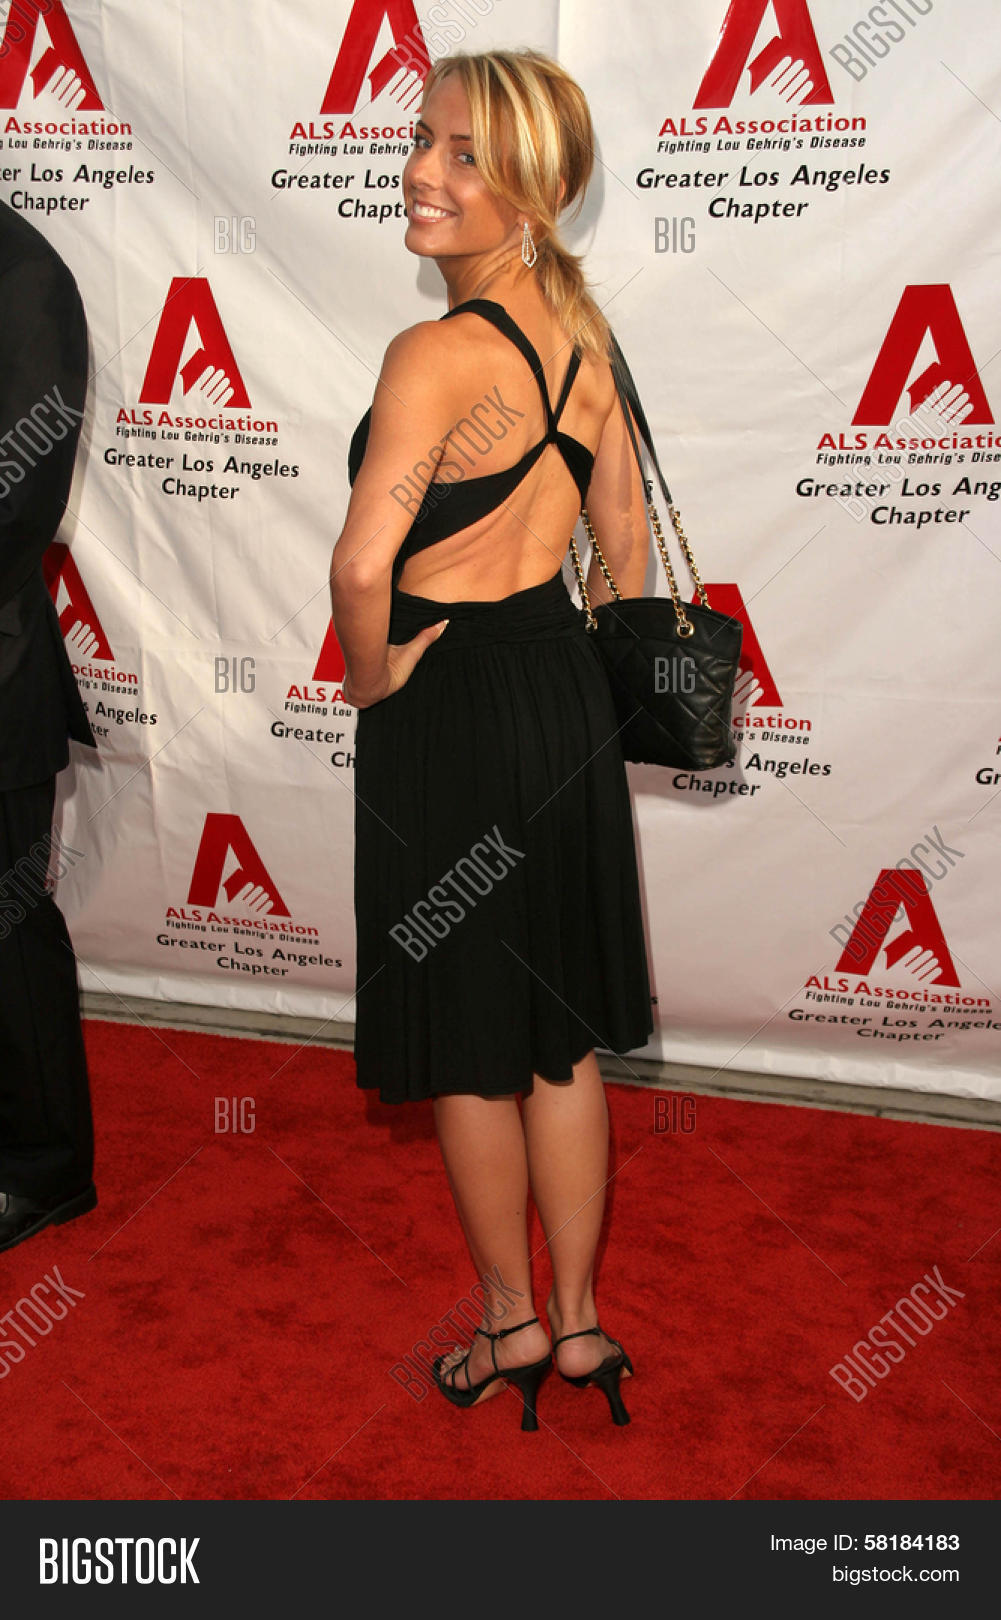 Jackie Torrens Erotic pic Mai Charoenpura,Amy Hill born May 9, 1953 (age 65)